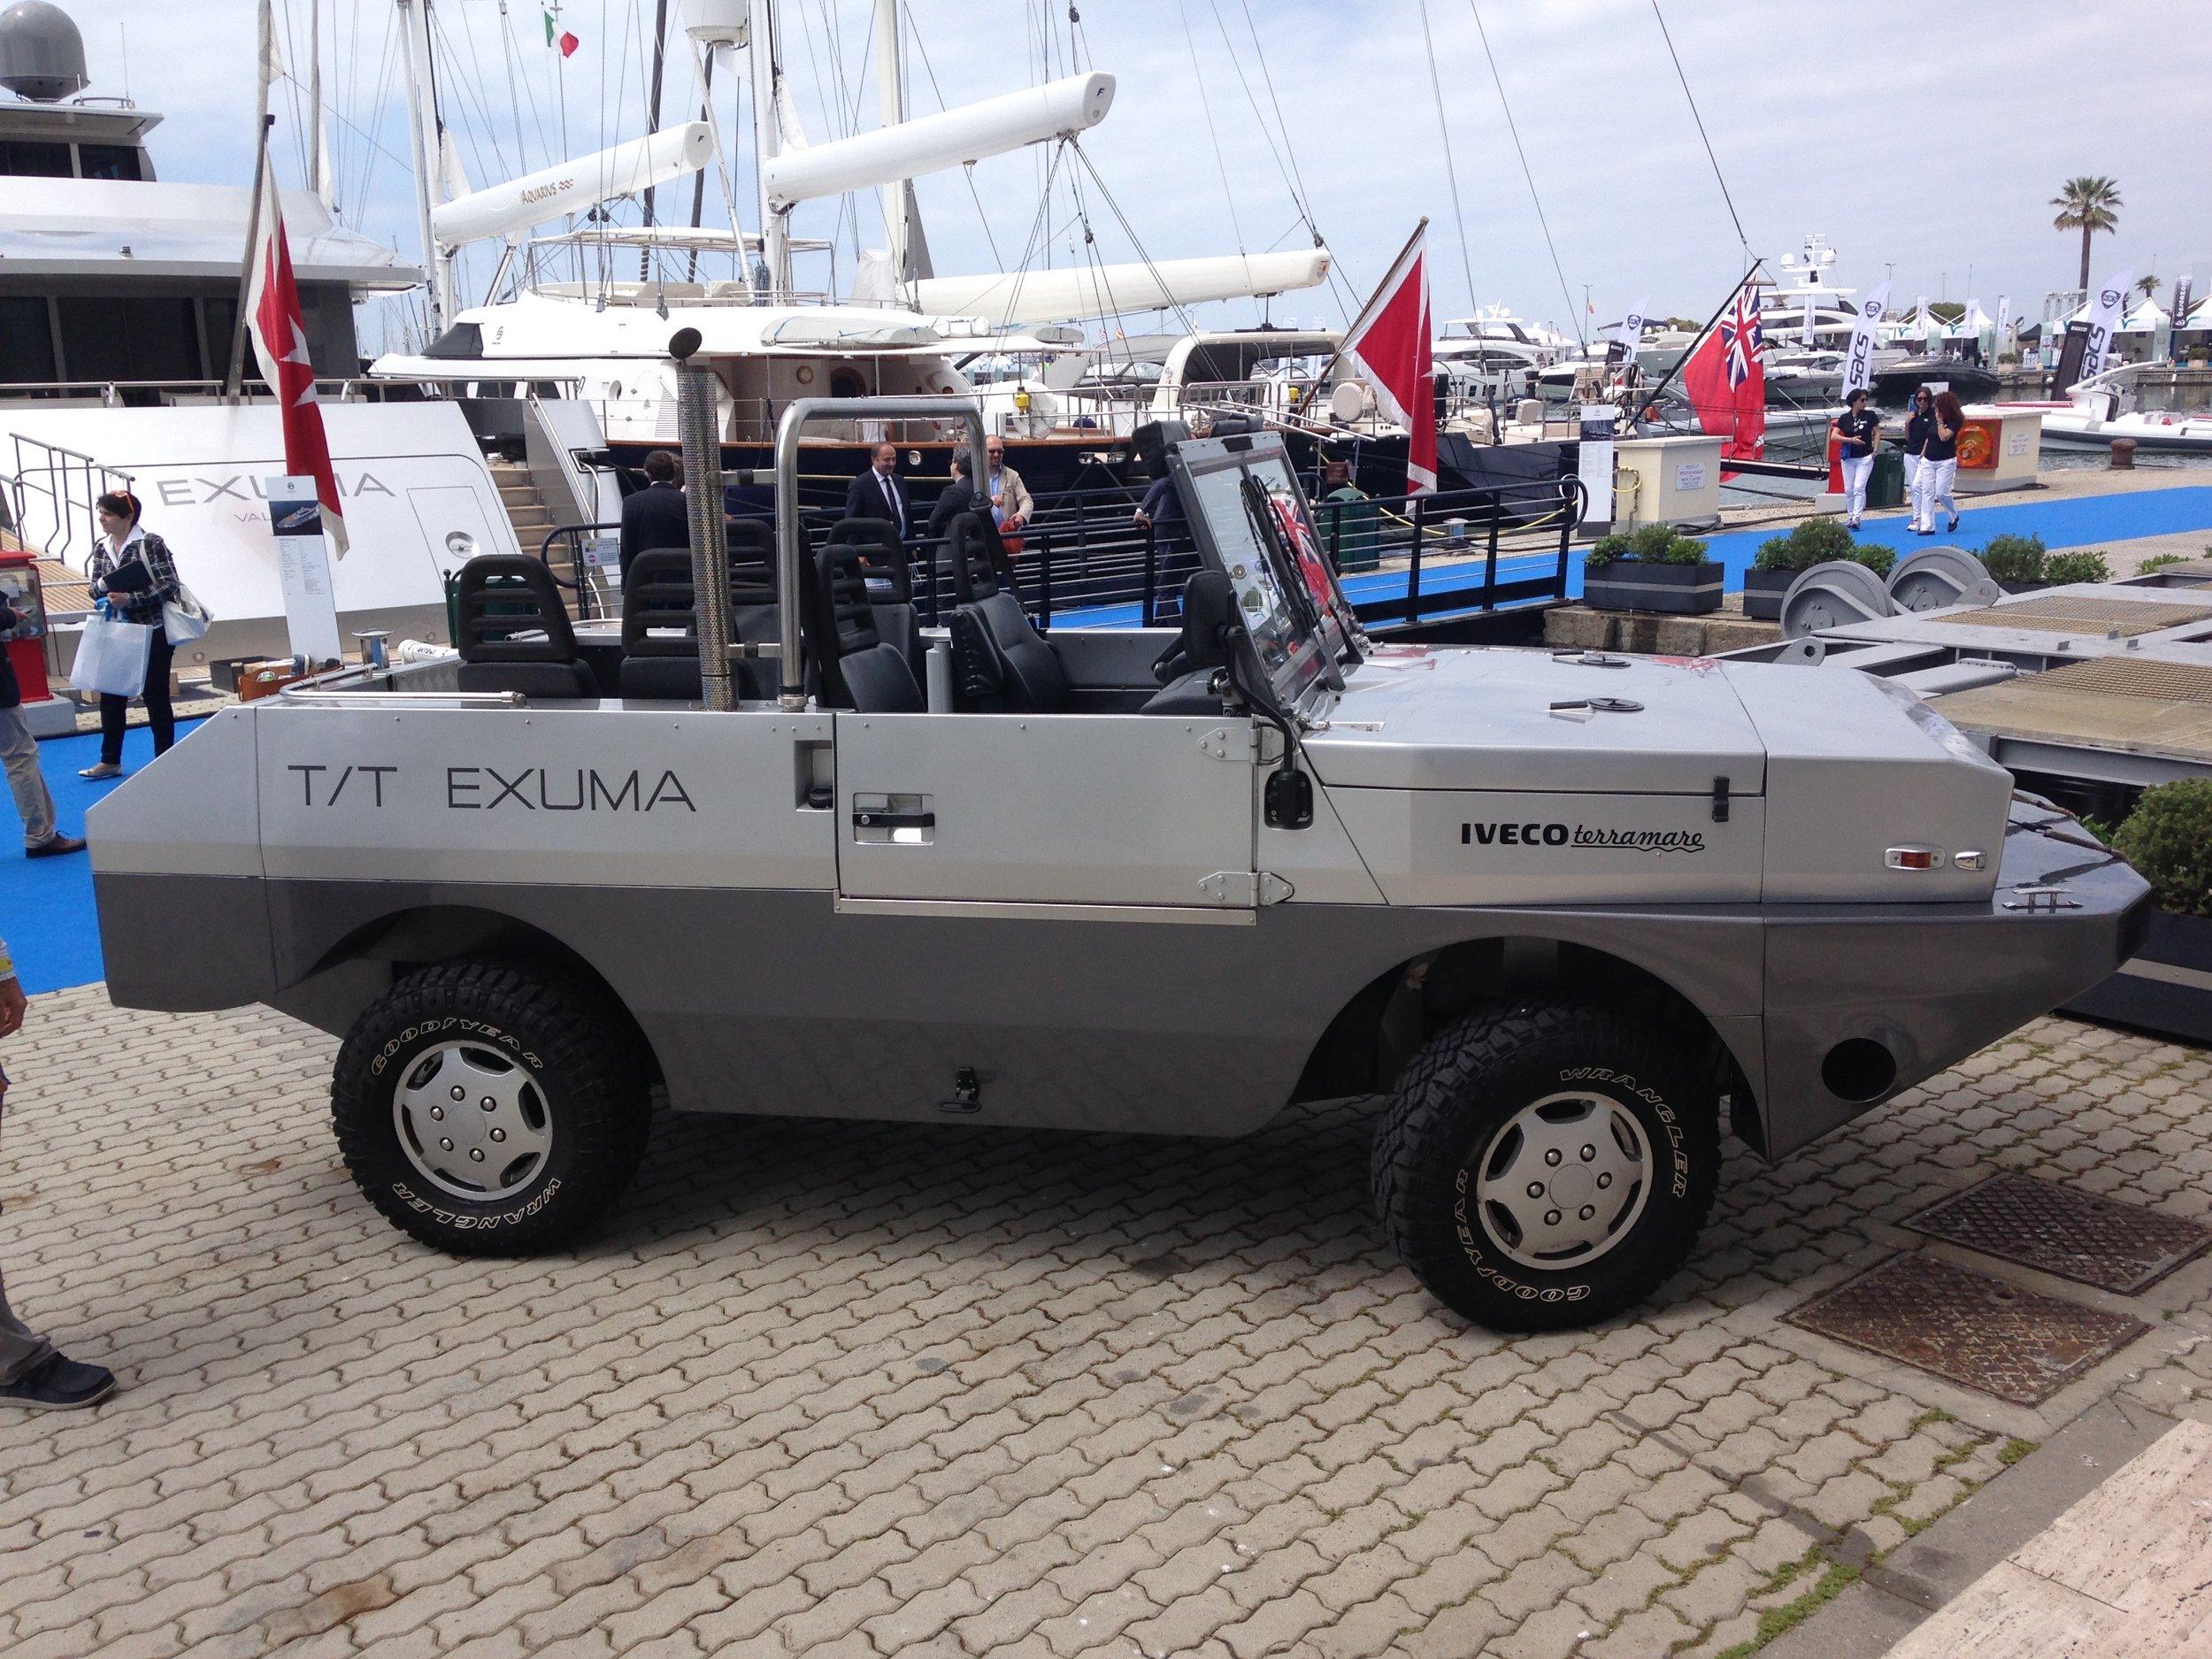 Amphibious Tender for M/Y Exuma